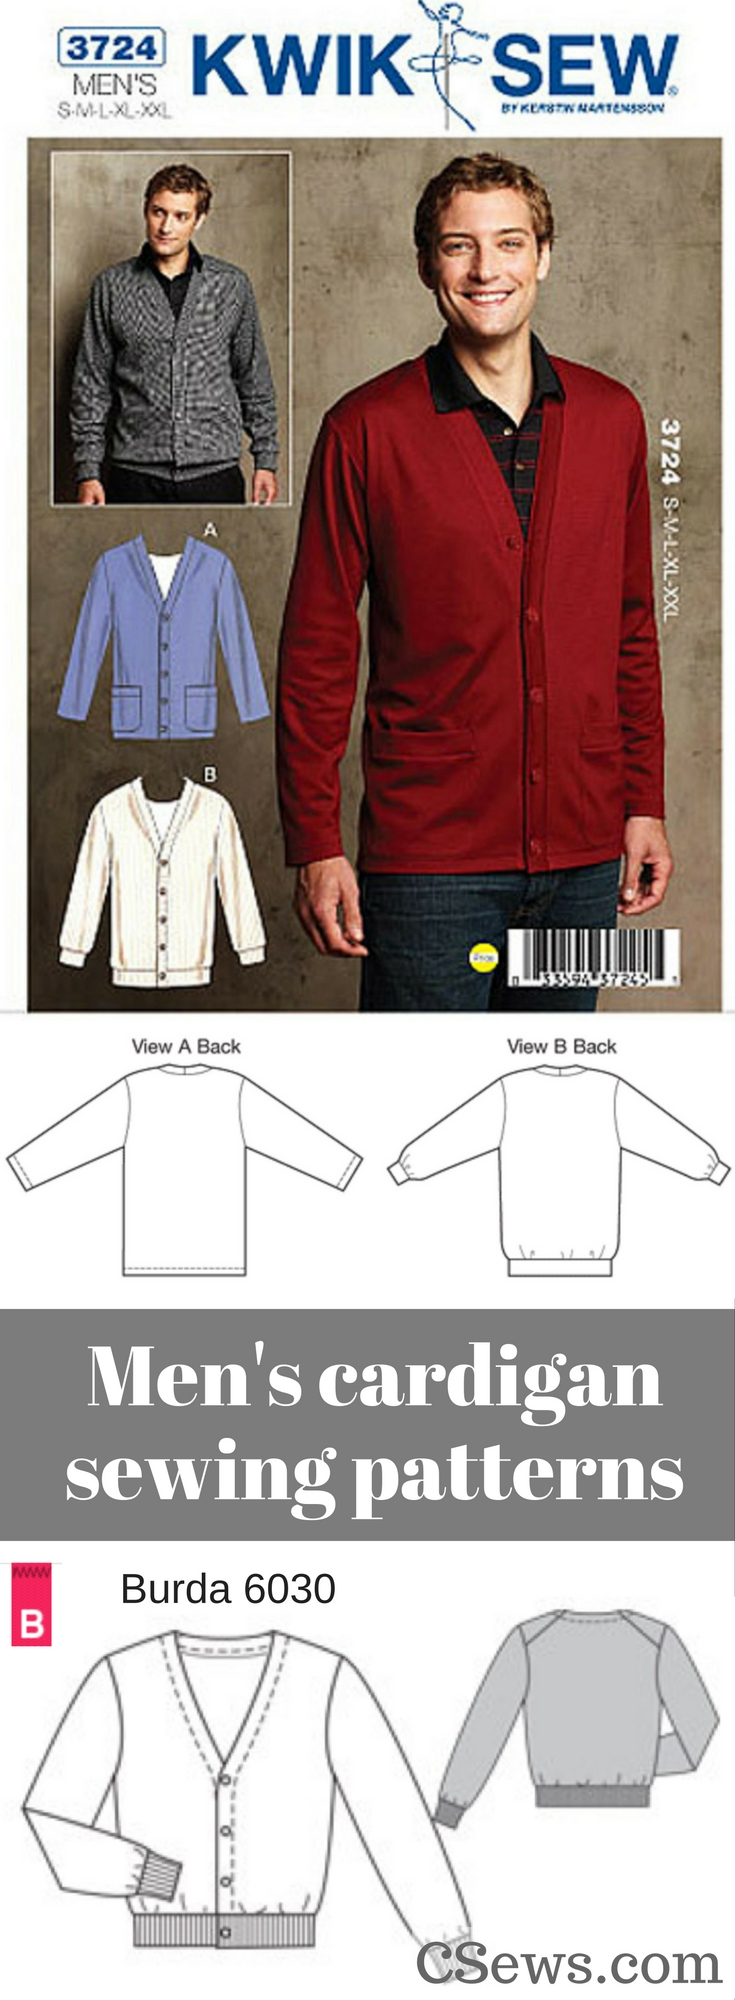 Men's cardigans patterns - Kwik Sew 3724 and Burda 6030 | menswear | sewing patterns